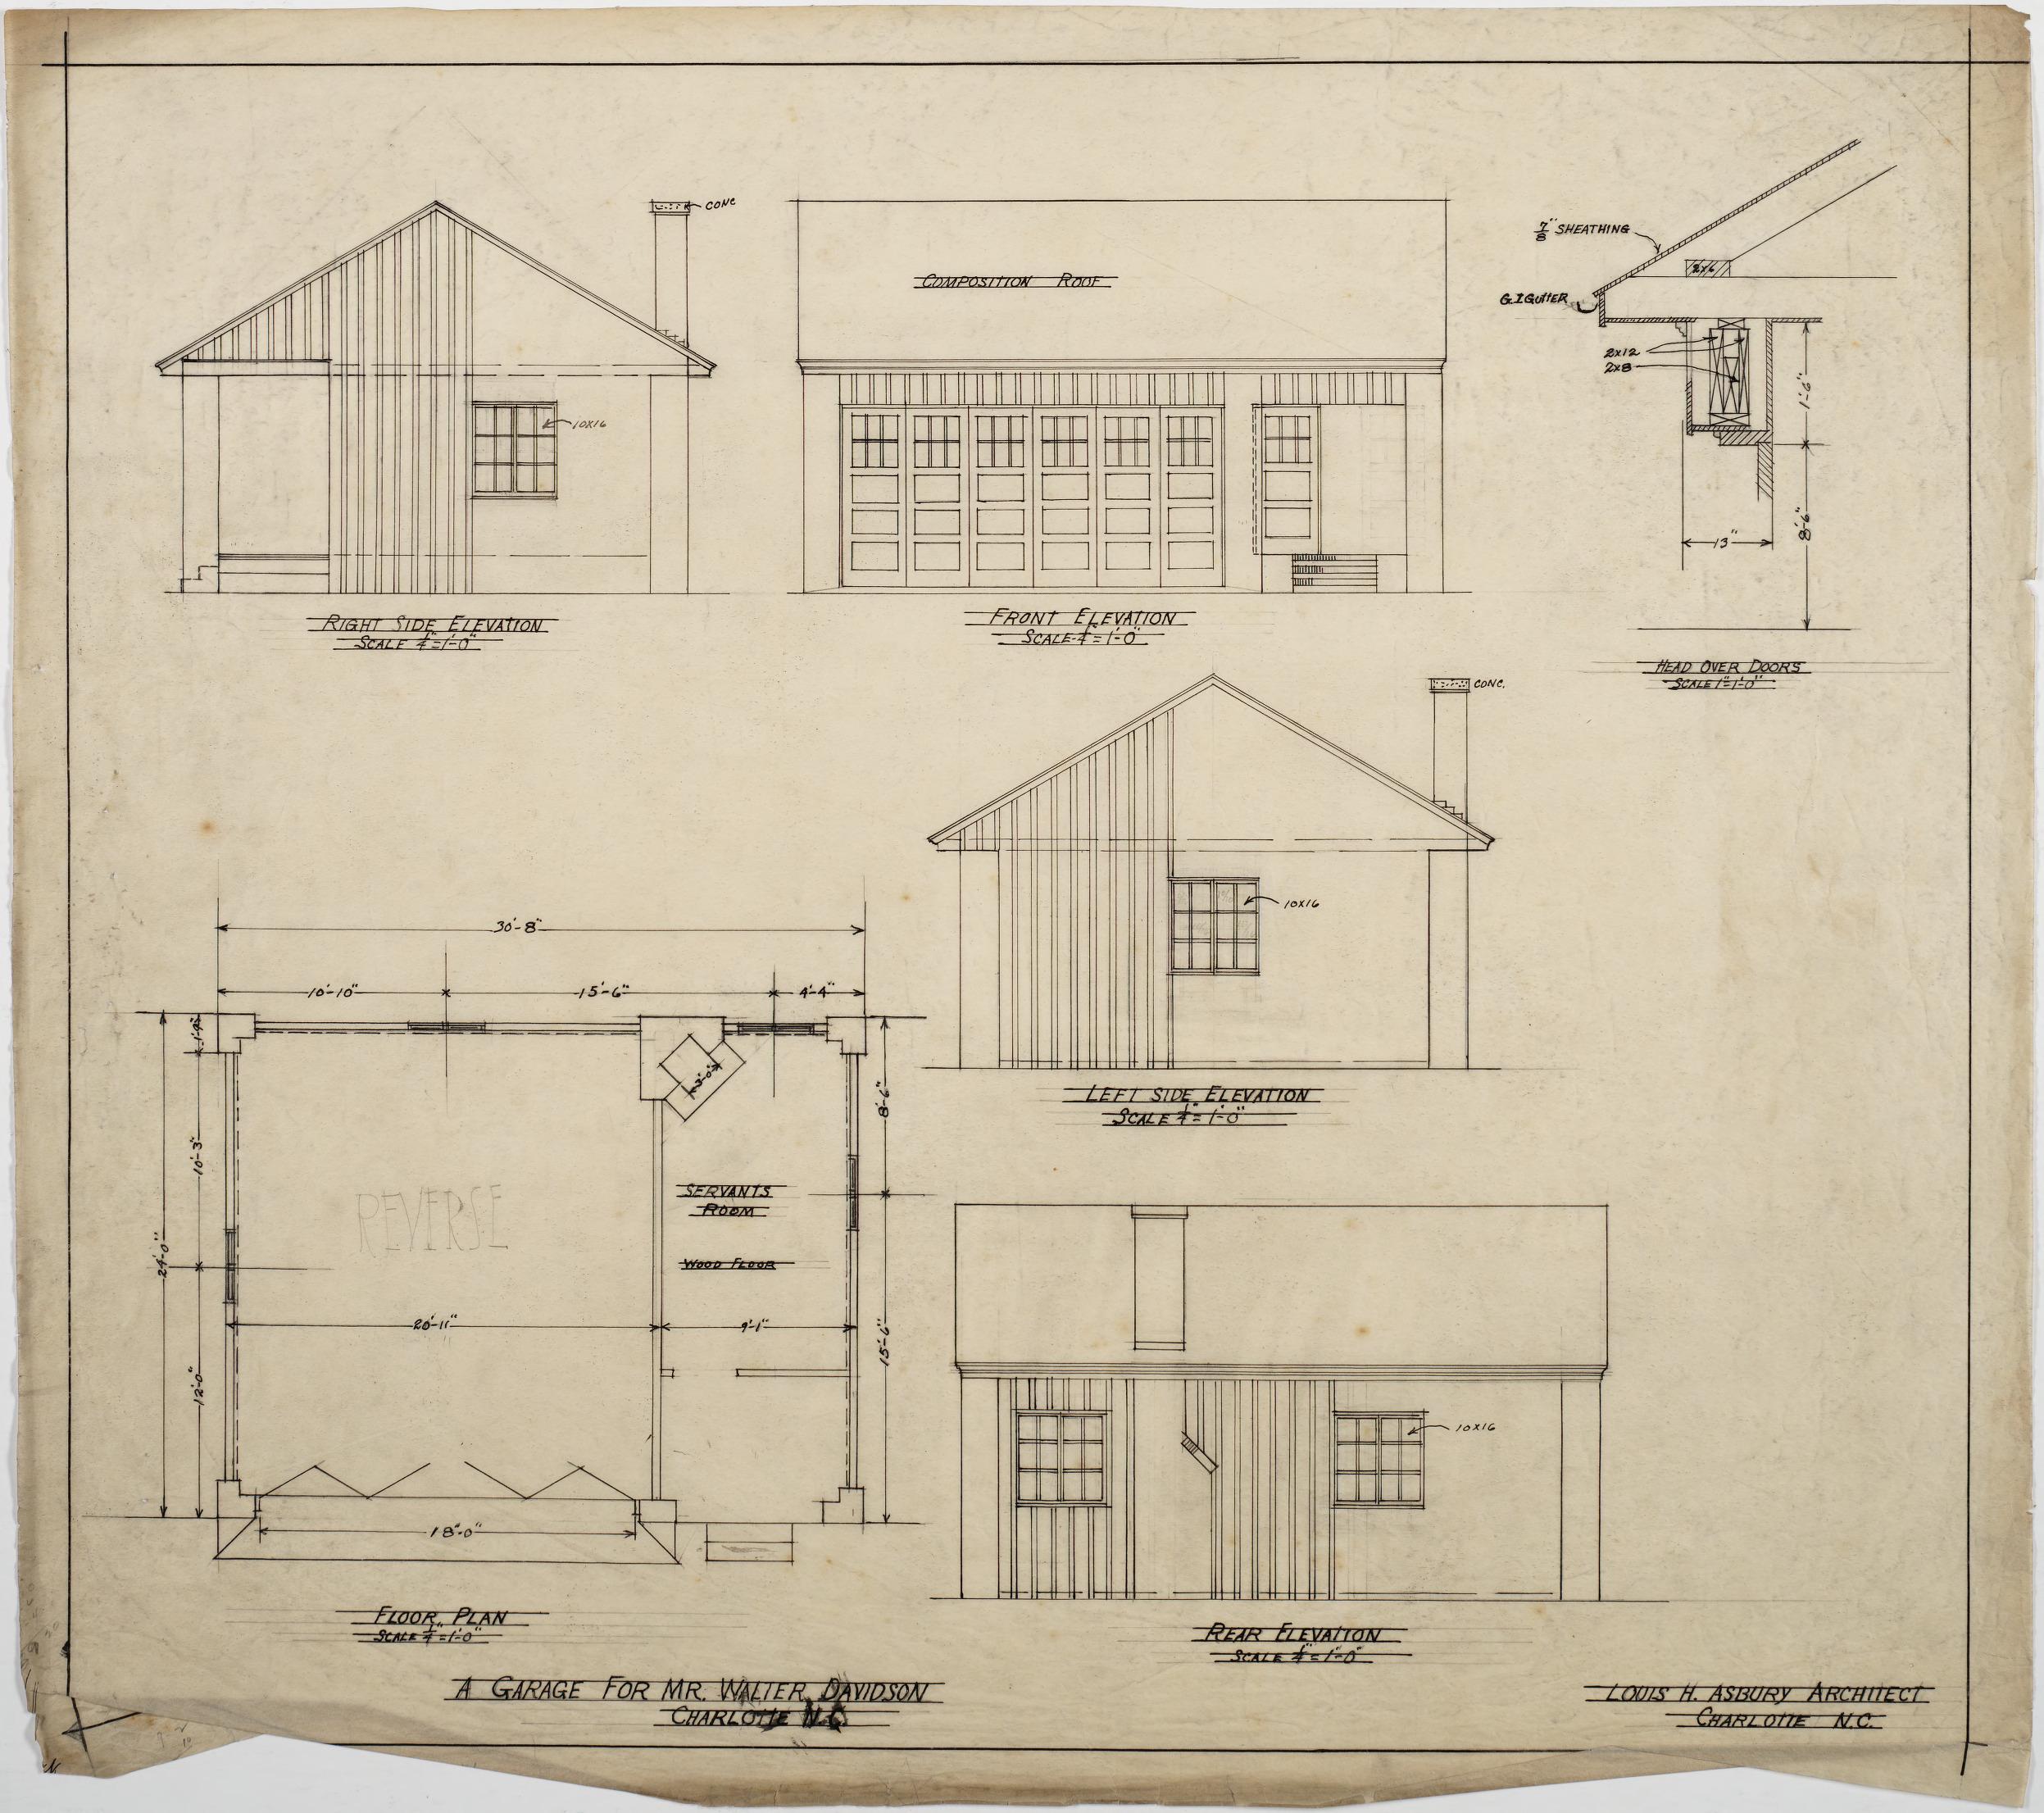 Garage Floor Elevation Code : Garage floor plan and elevations walter davidson house